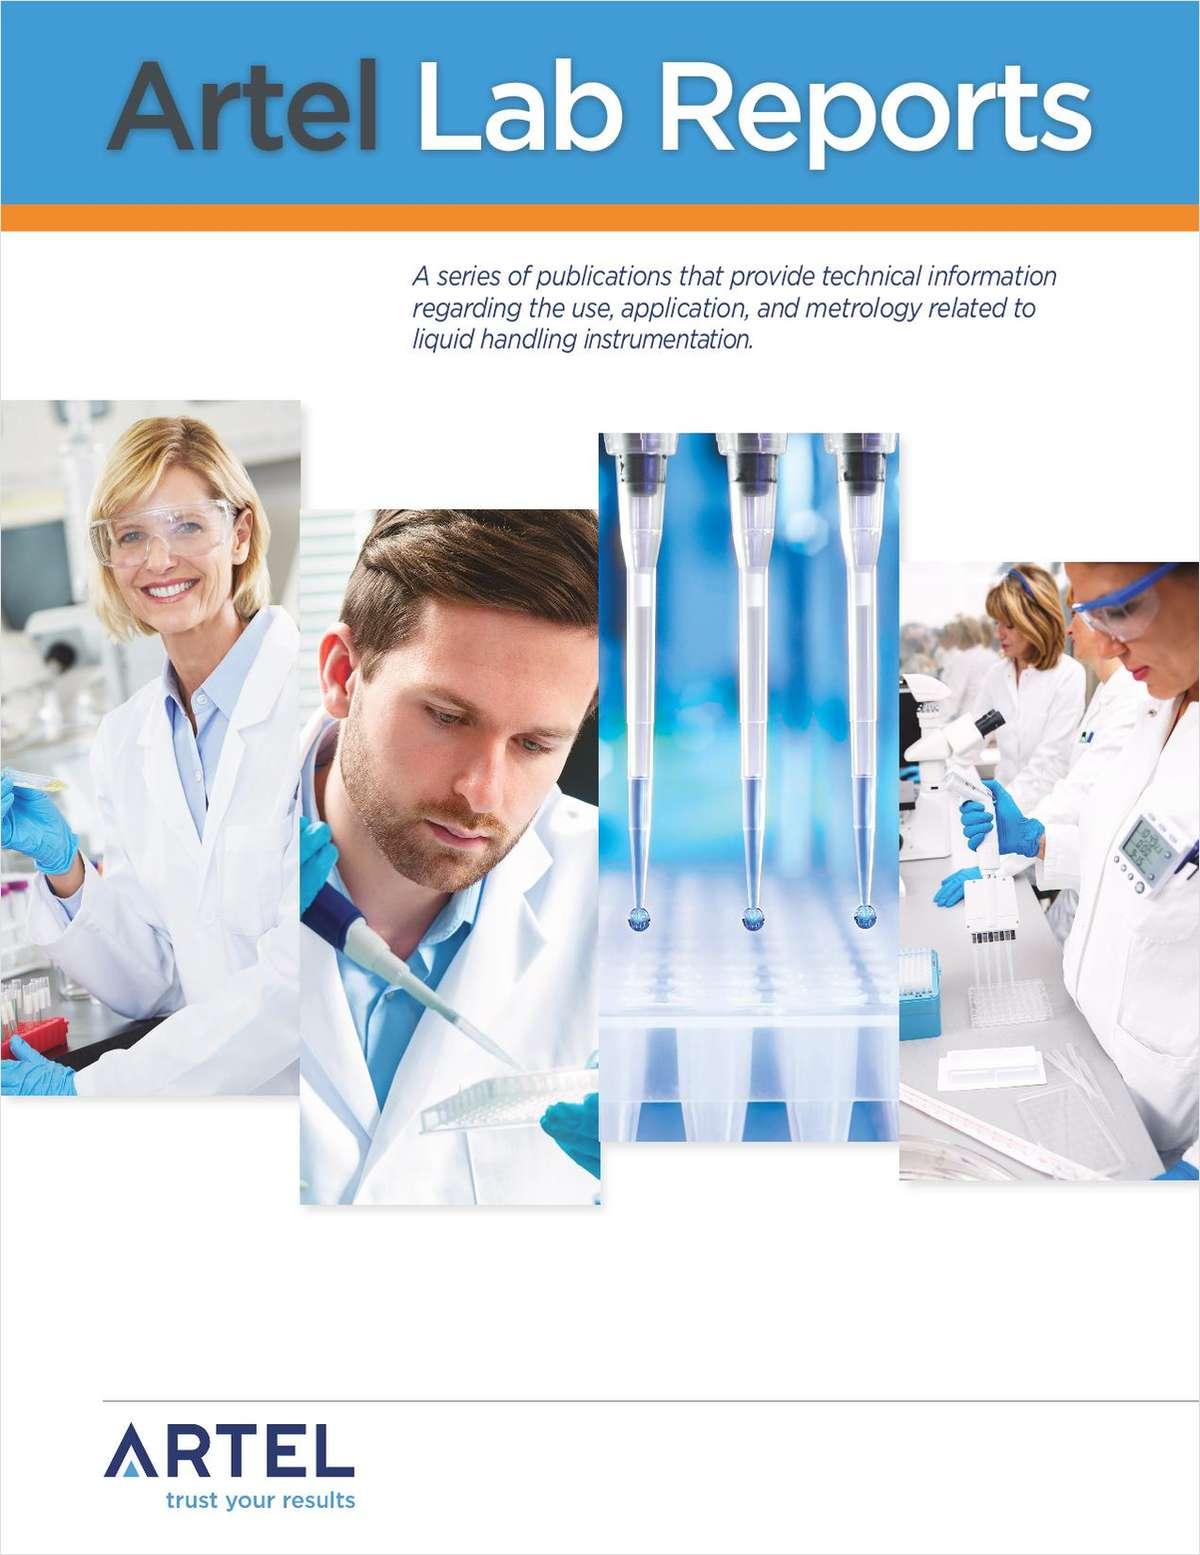 Artel Lab Reports